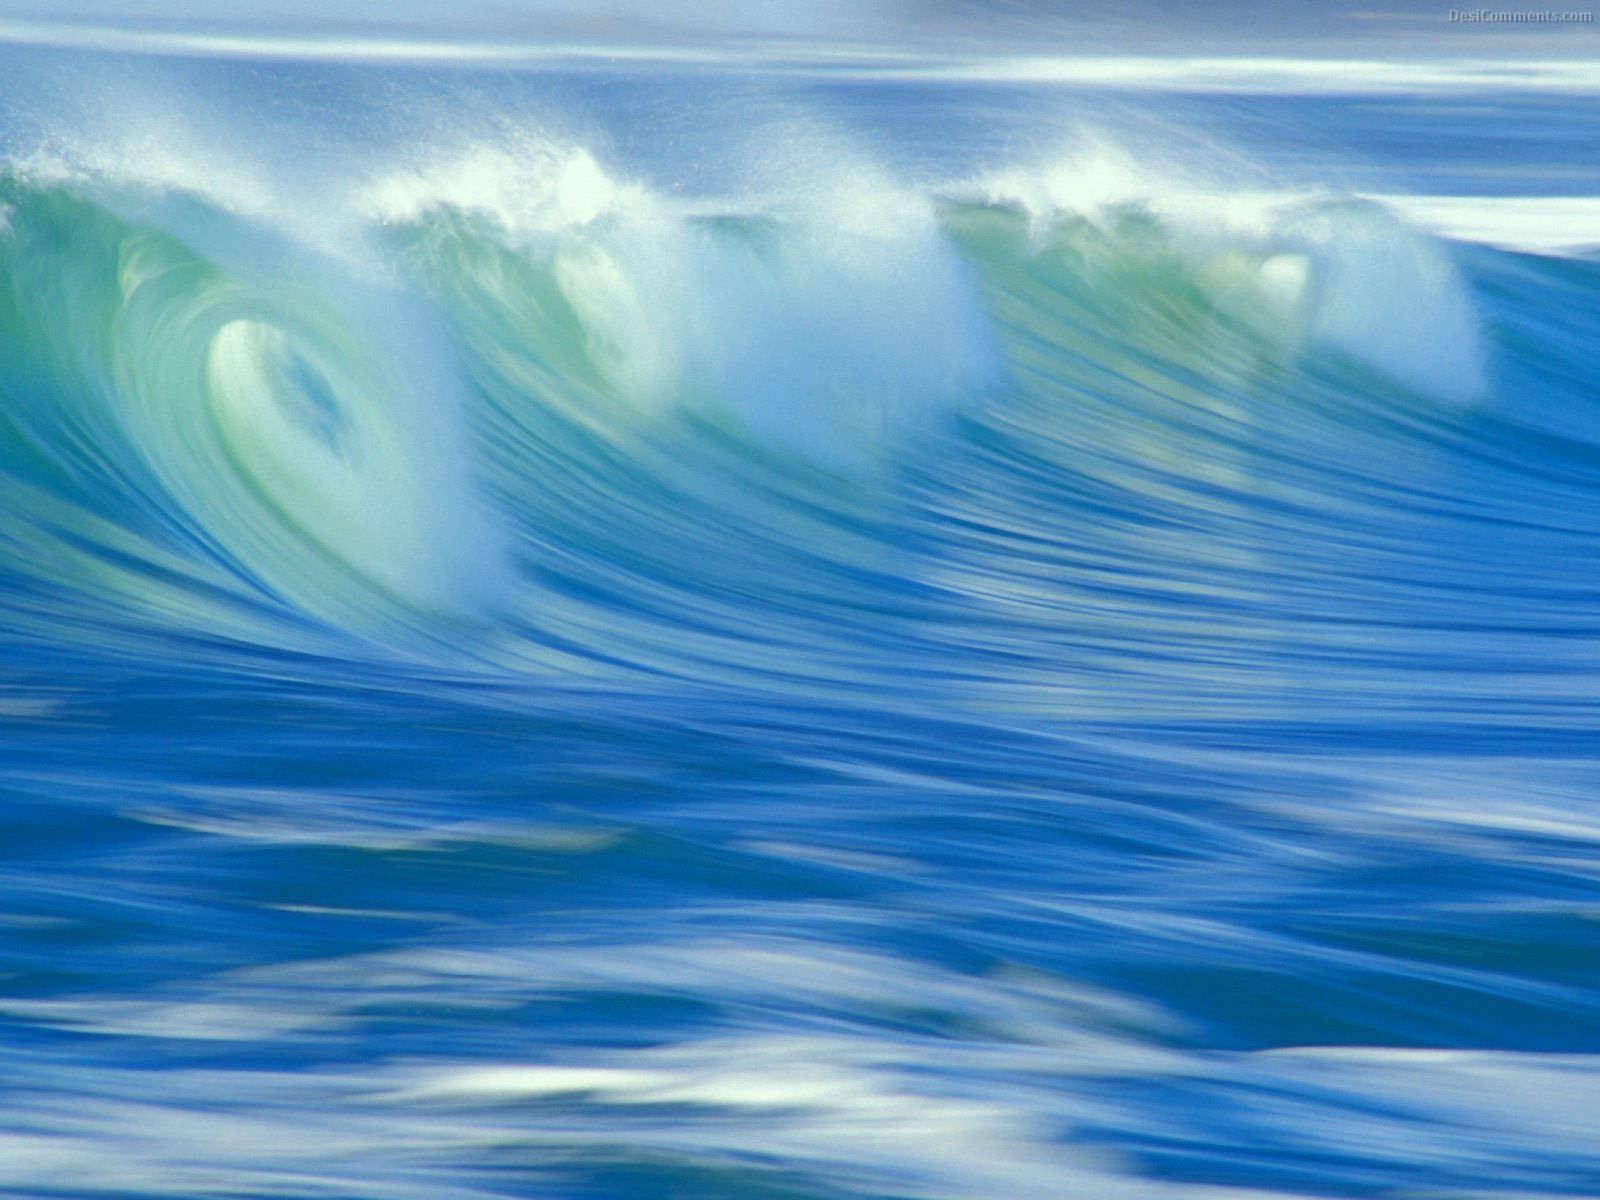 Ocean Wallpaper 4   DesiCommentscom 1600x1200